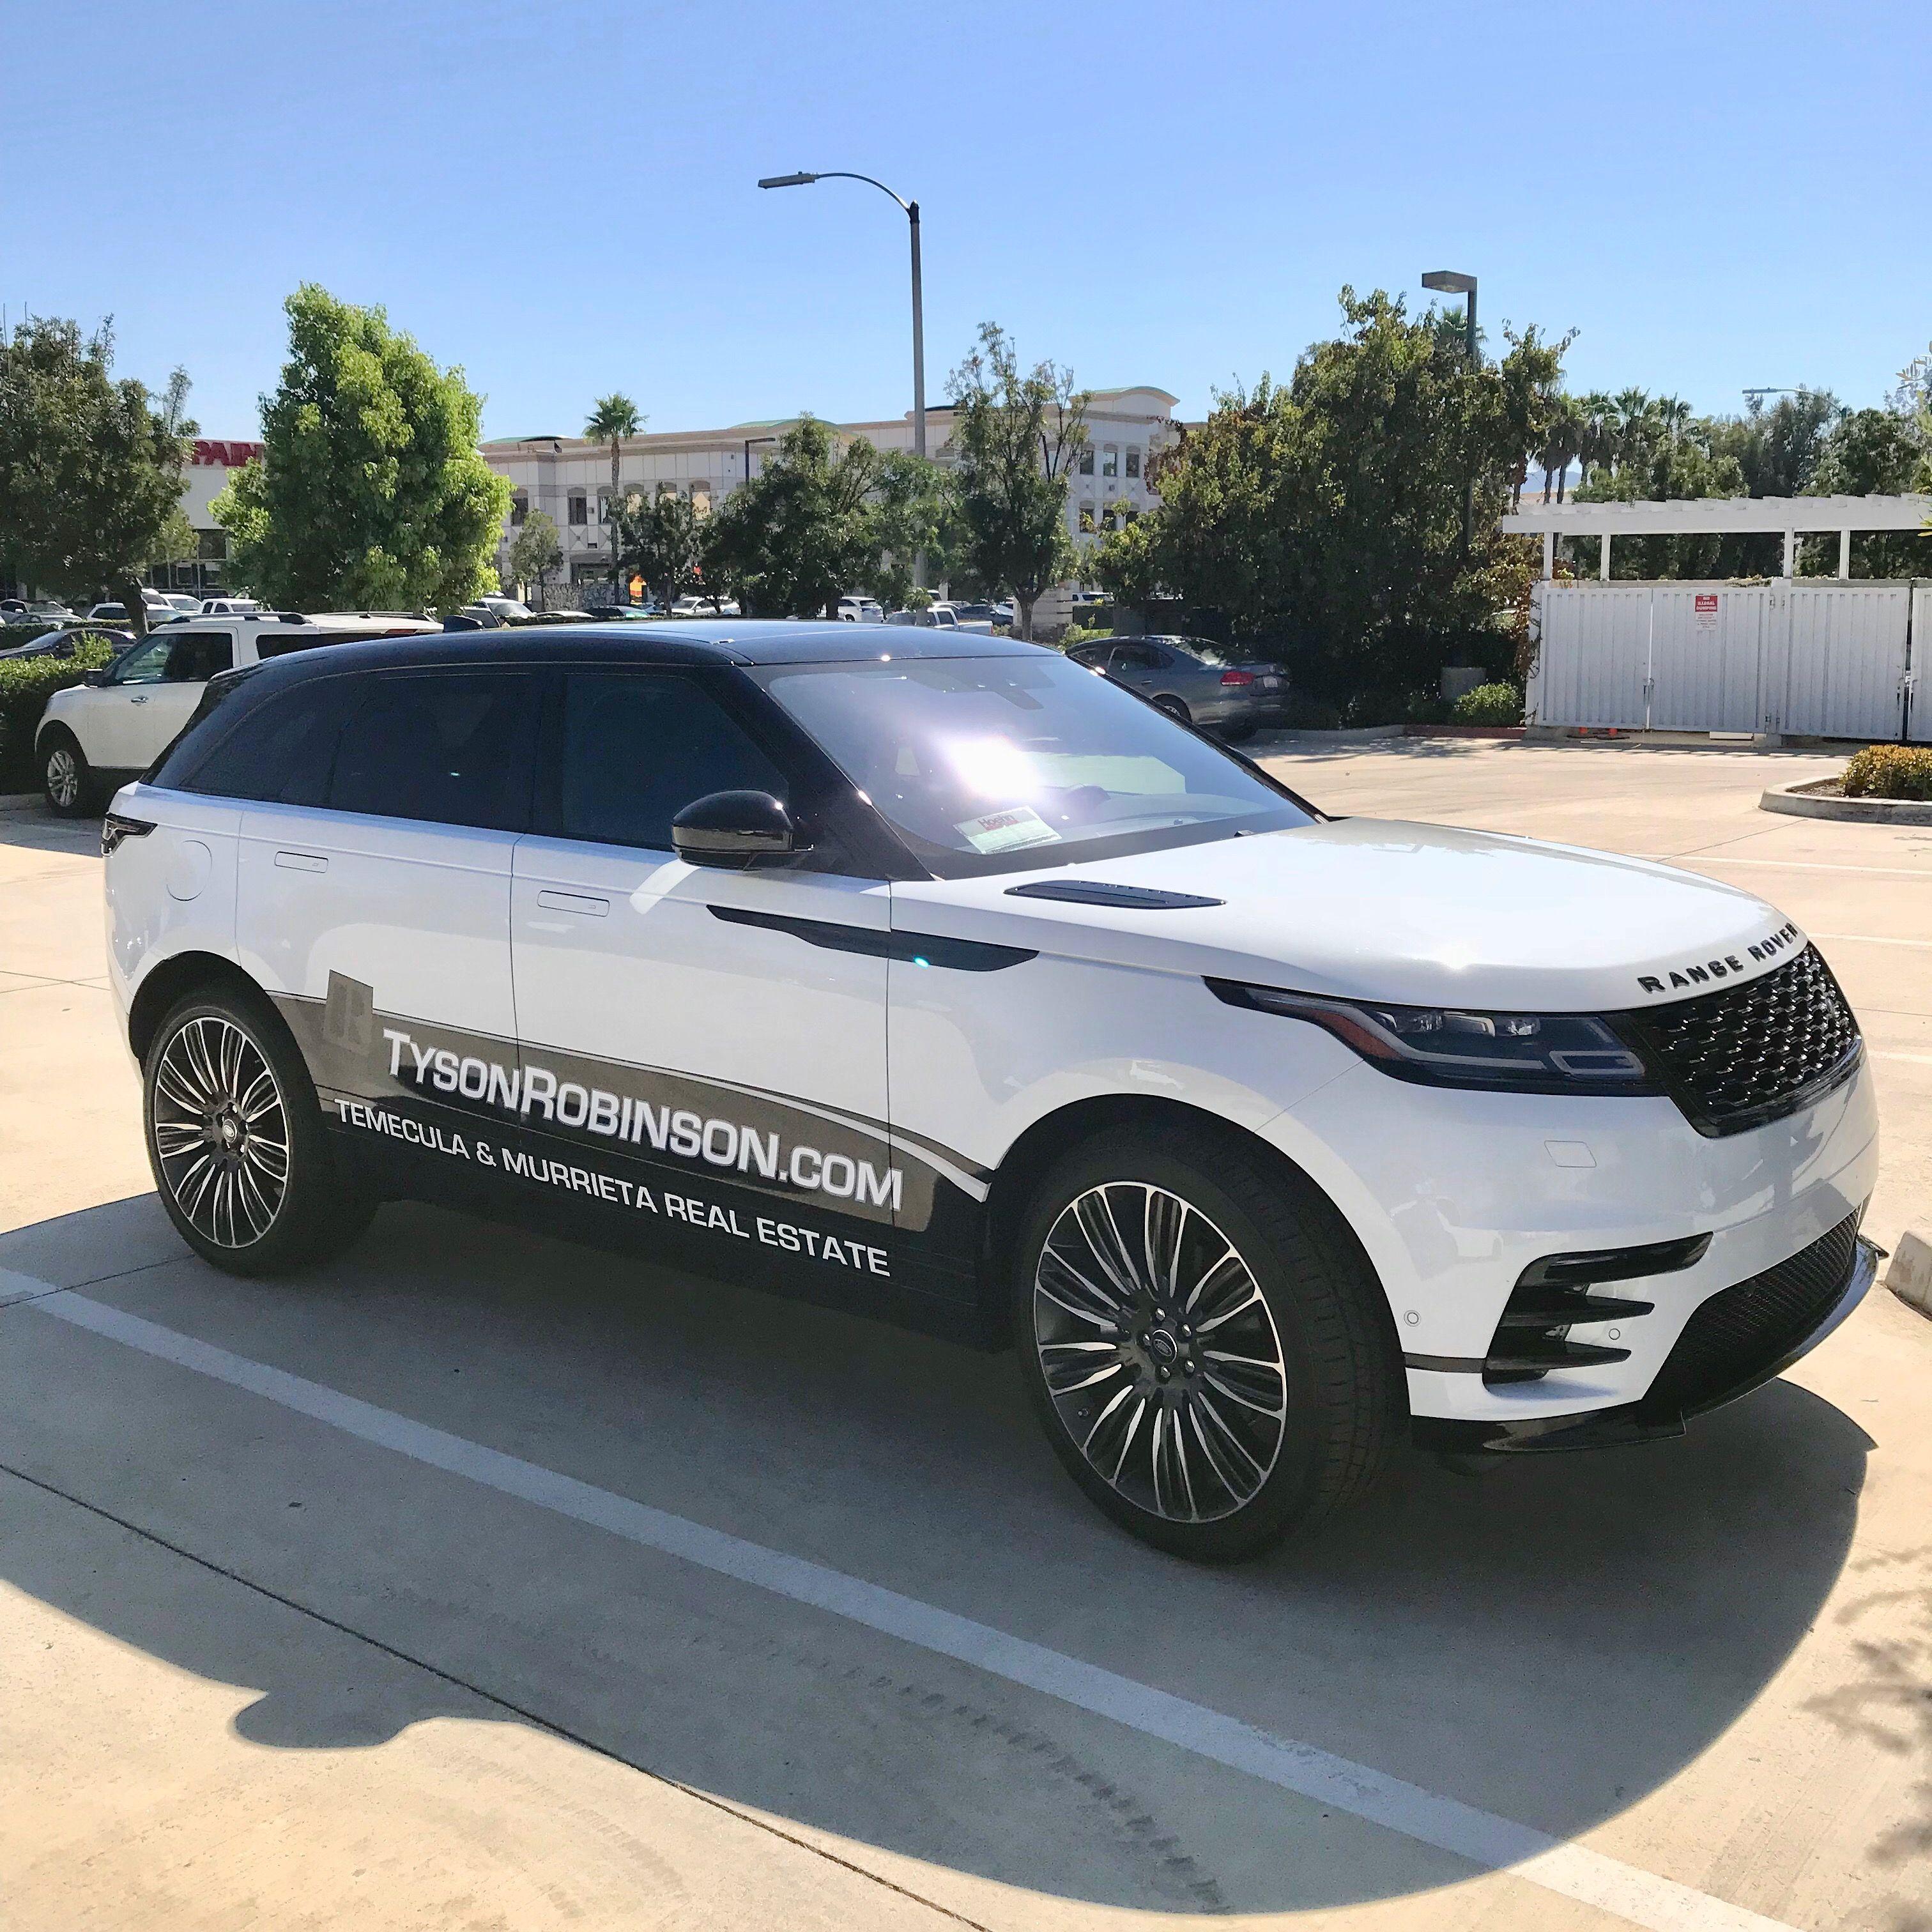 2018 Range Rover Velar With Wrap Www Tysonrobinson Com Vinyl Wrap Car Range Rover Kia Stinger